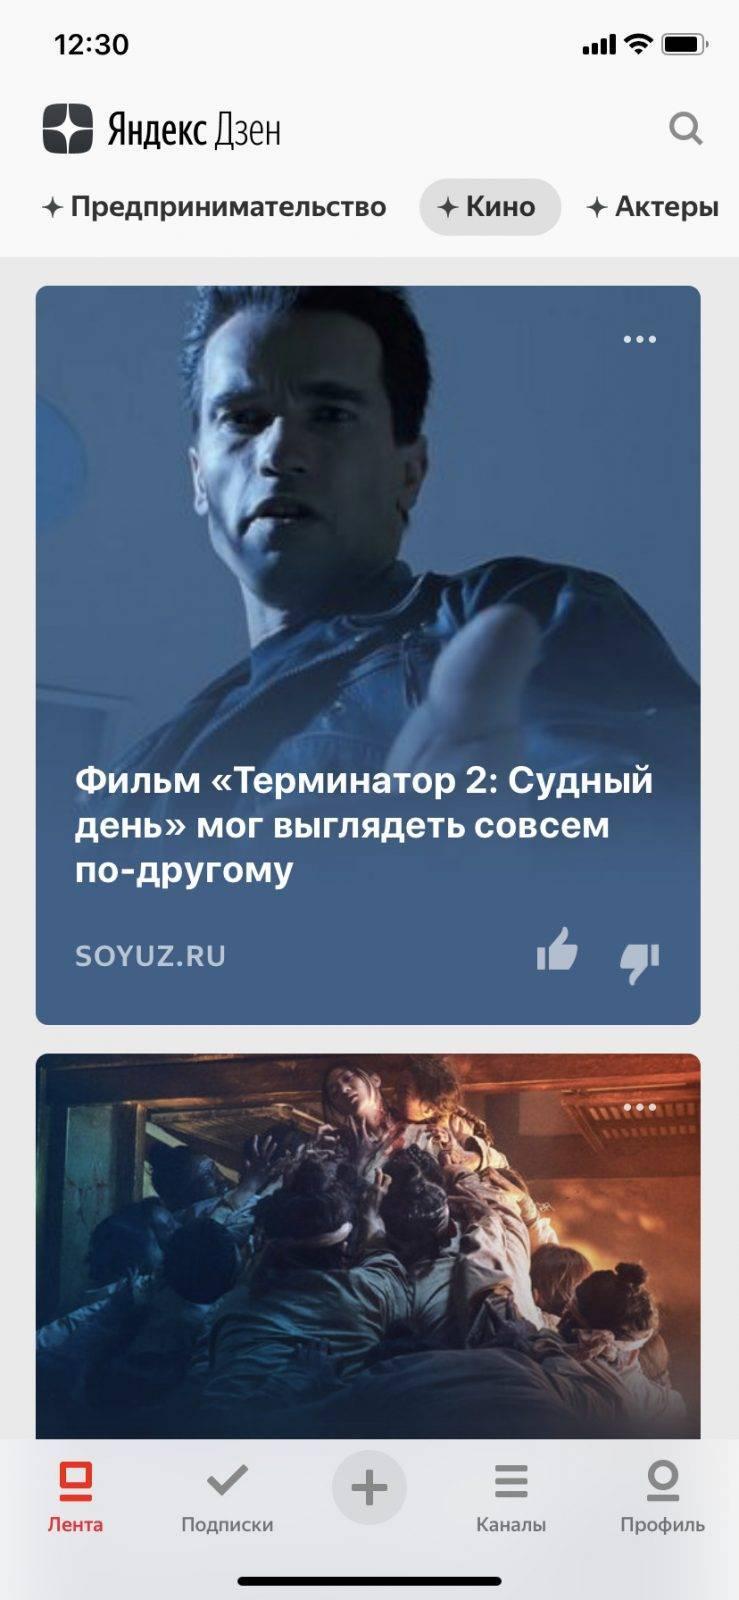 ЯндексДзен для предпринимателей. За и против